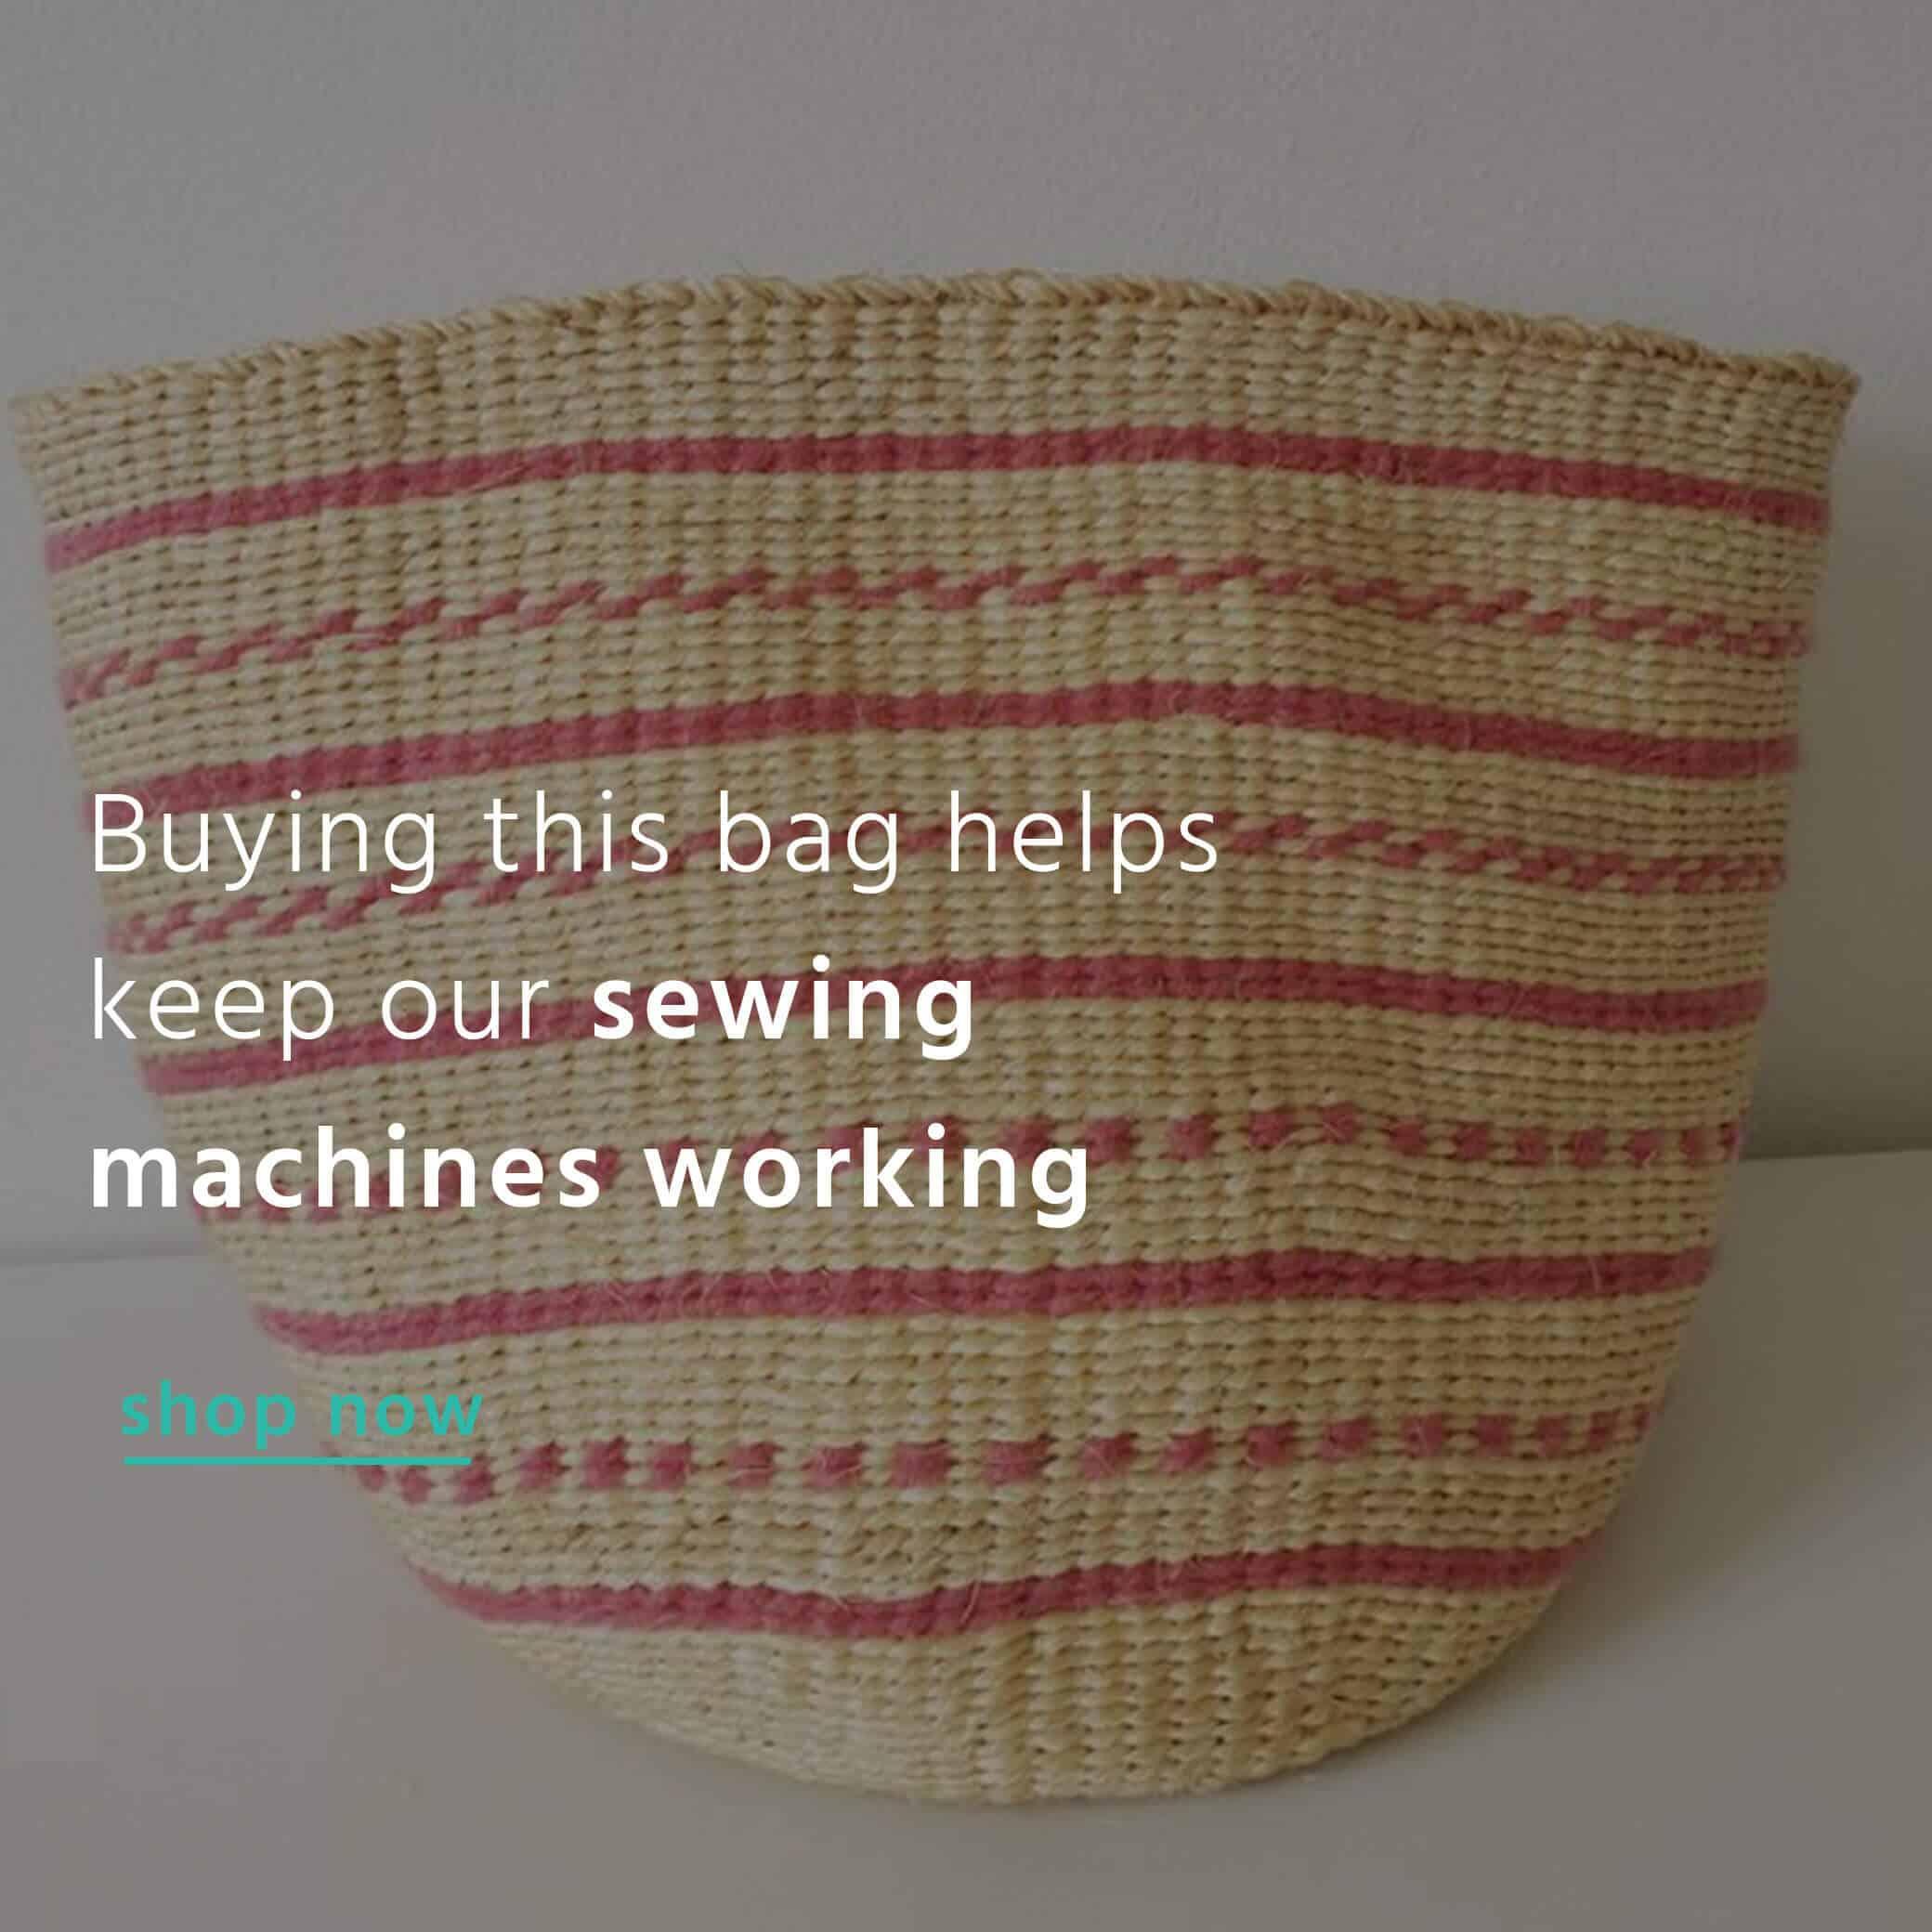 Buy a bag bibi&me and create change